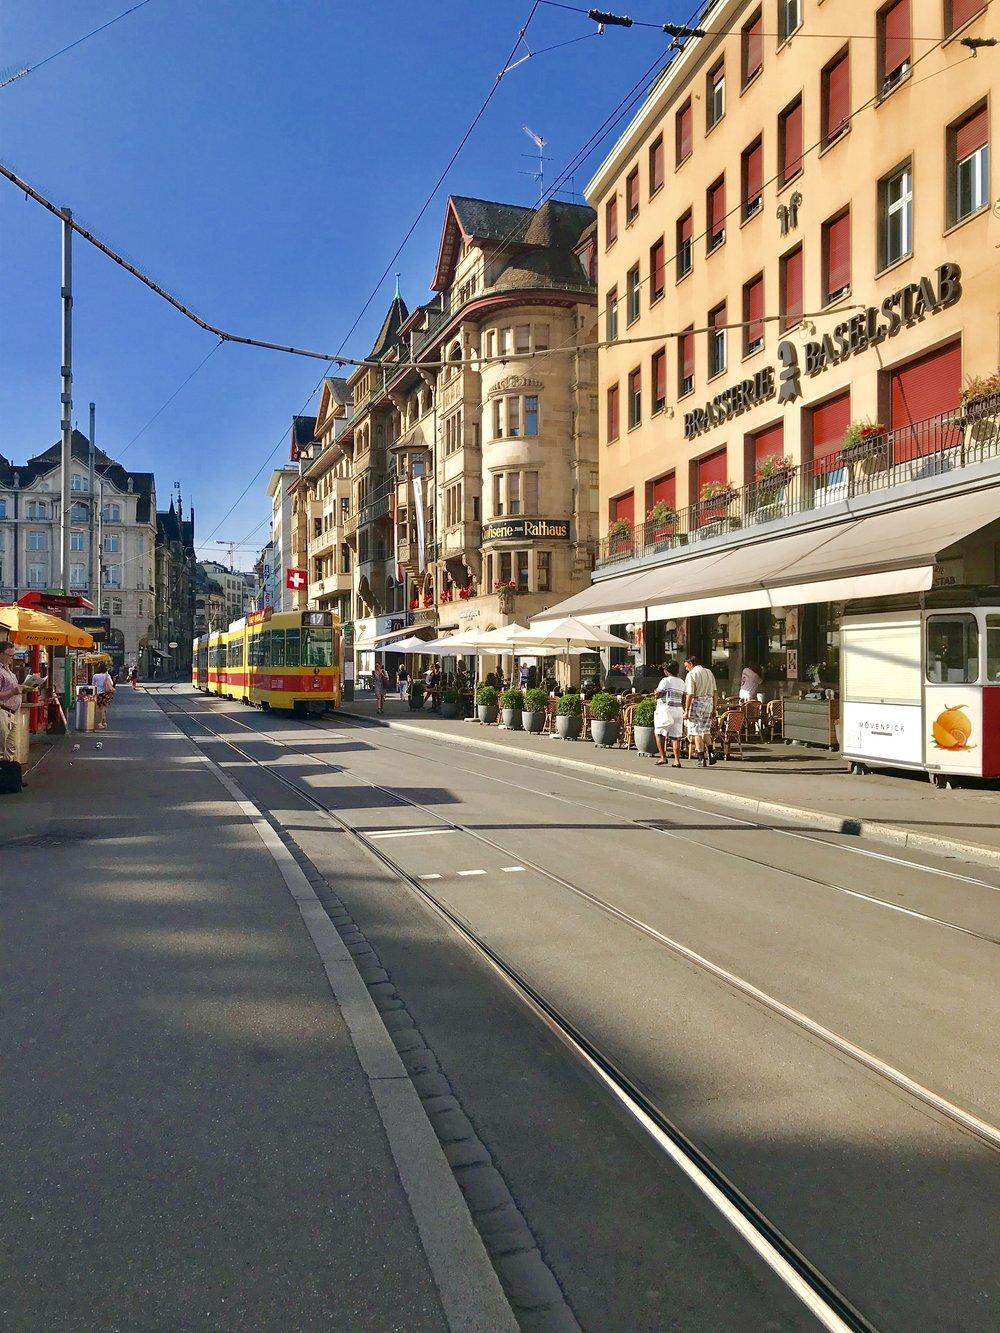 Marktplatz, Basel.Photo: Naomi Tsvirko